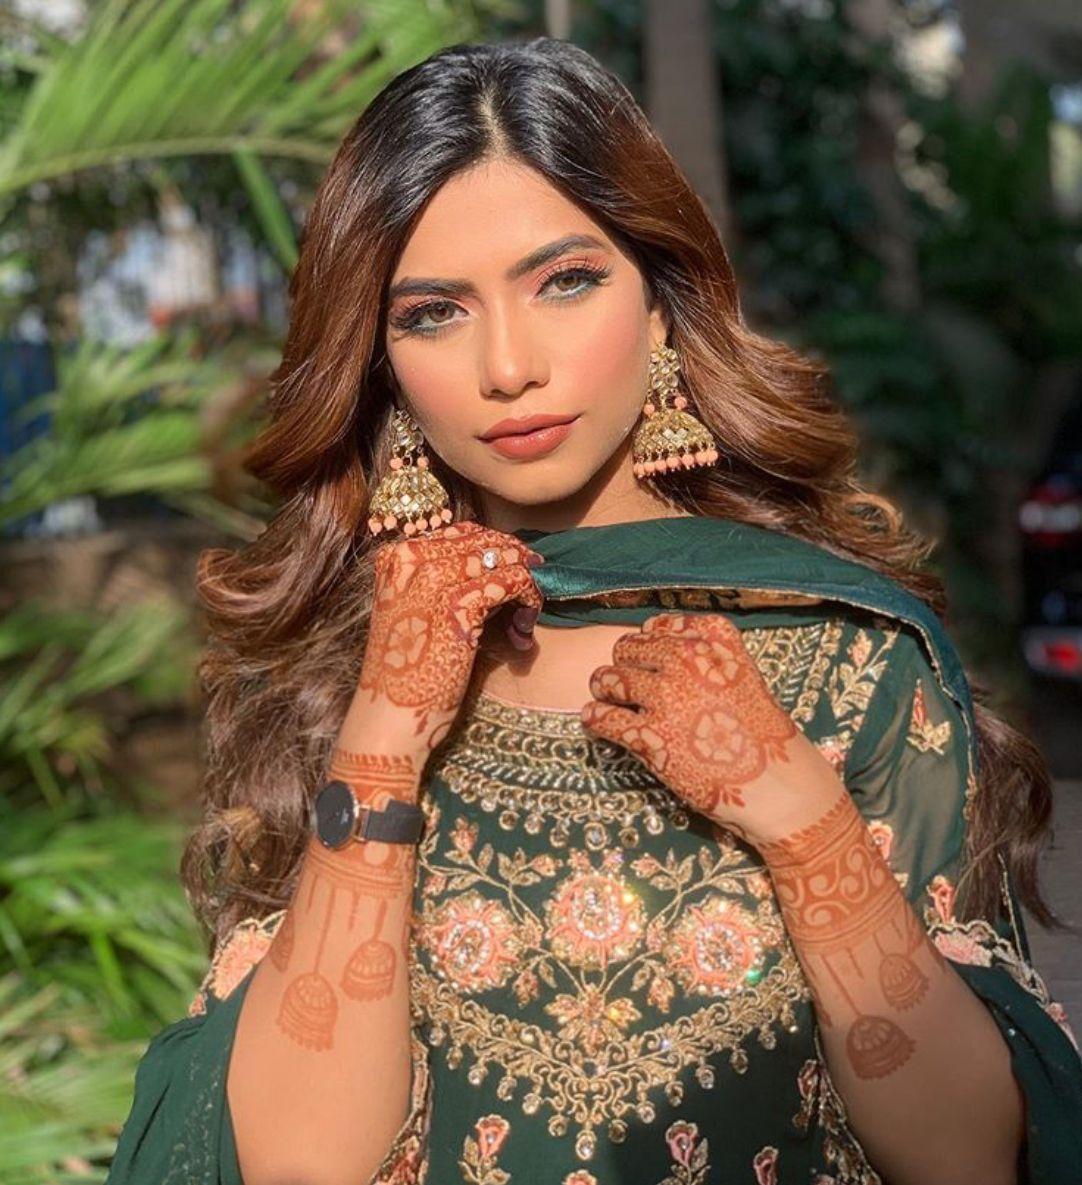 Follow me Yashika Singhaniya | viah dress/jewelry in 2019